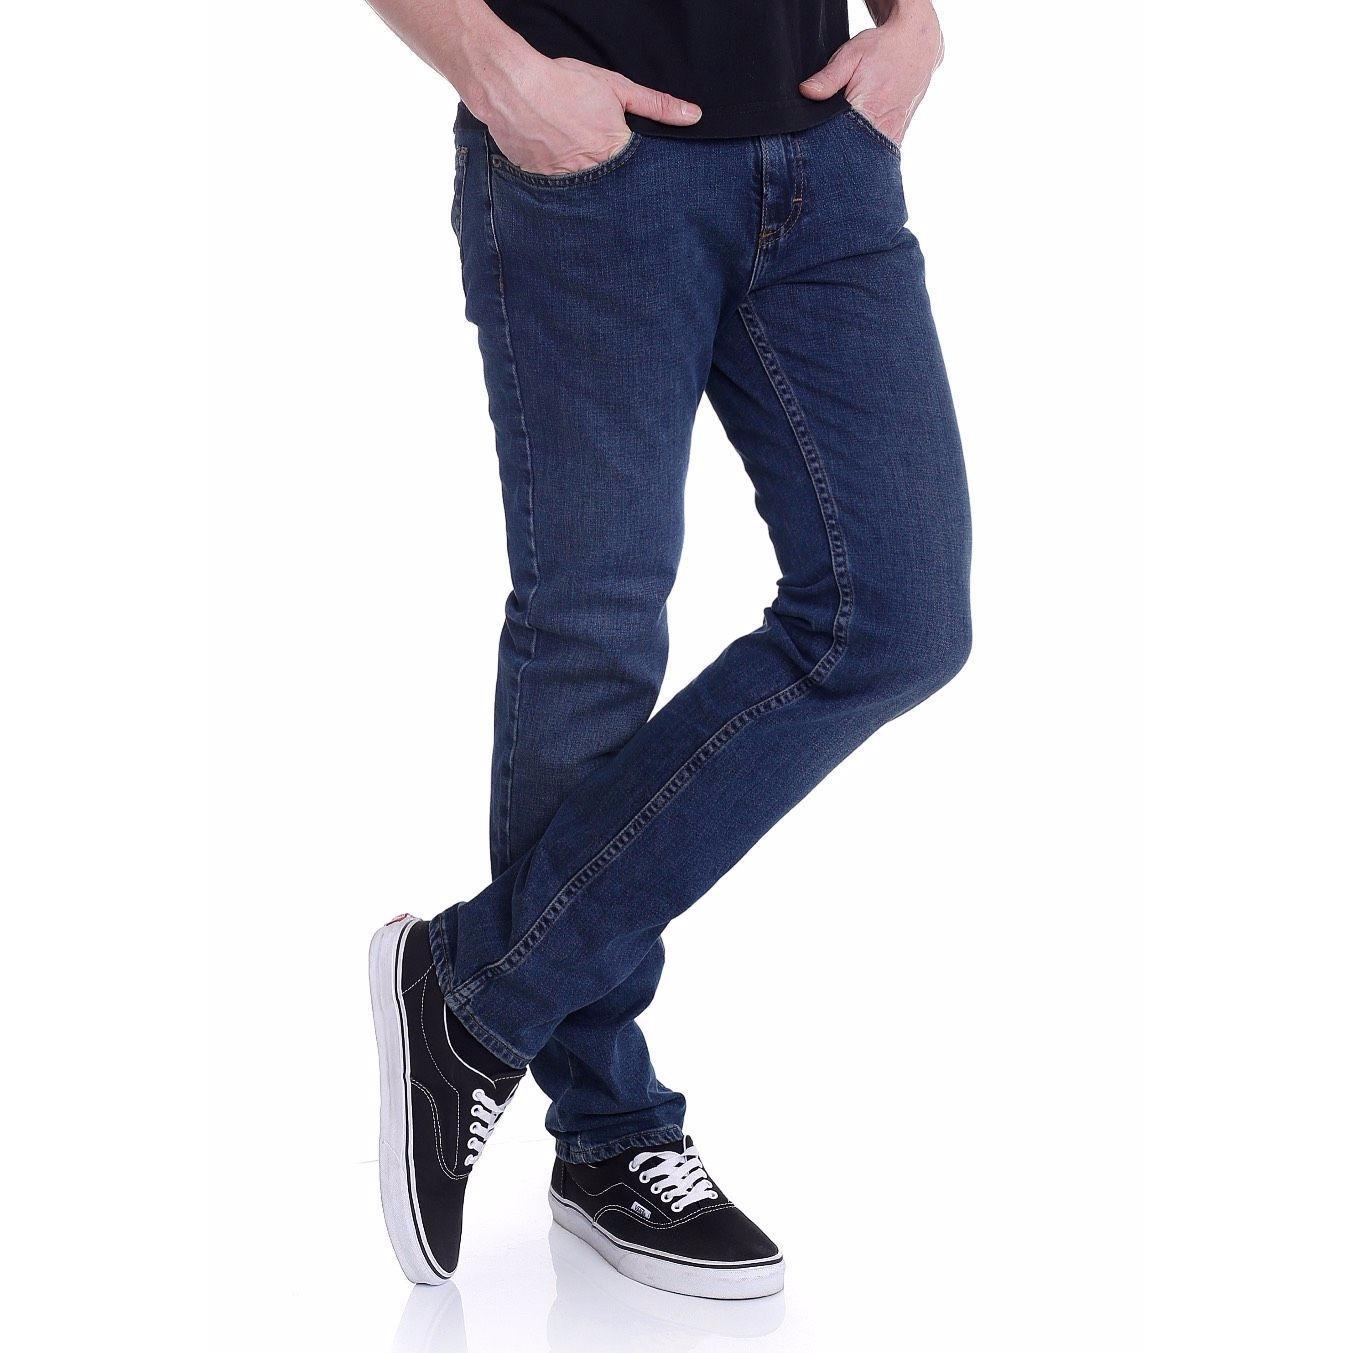 KERAK STORE Celana Jeans Pria Premium - Skiny jeans Pria Strreat